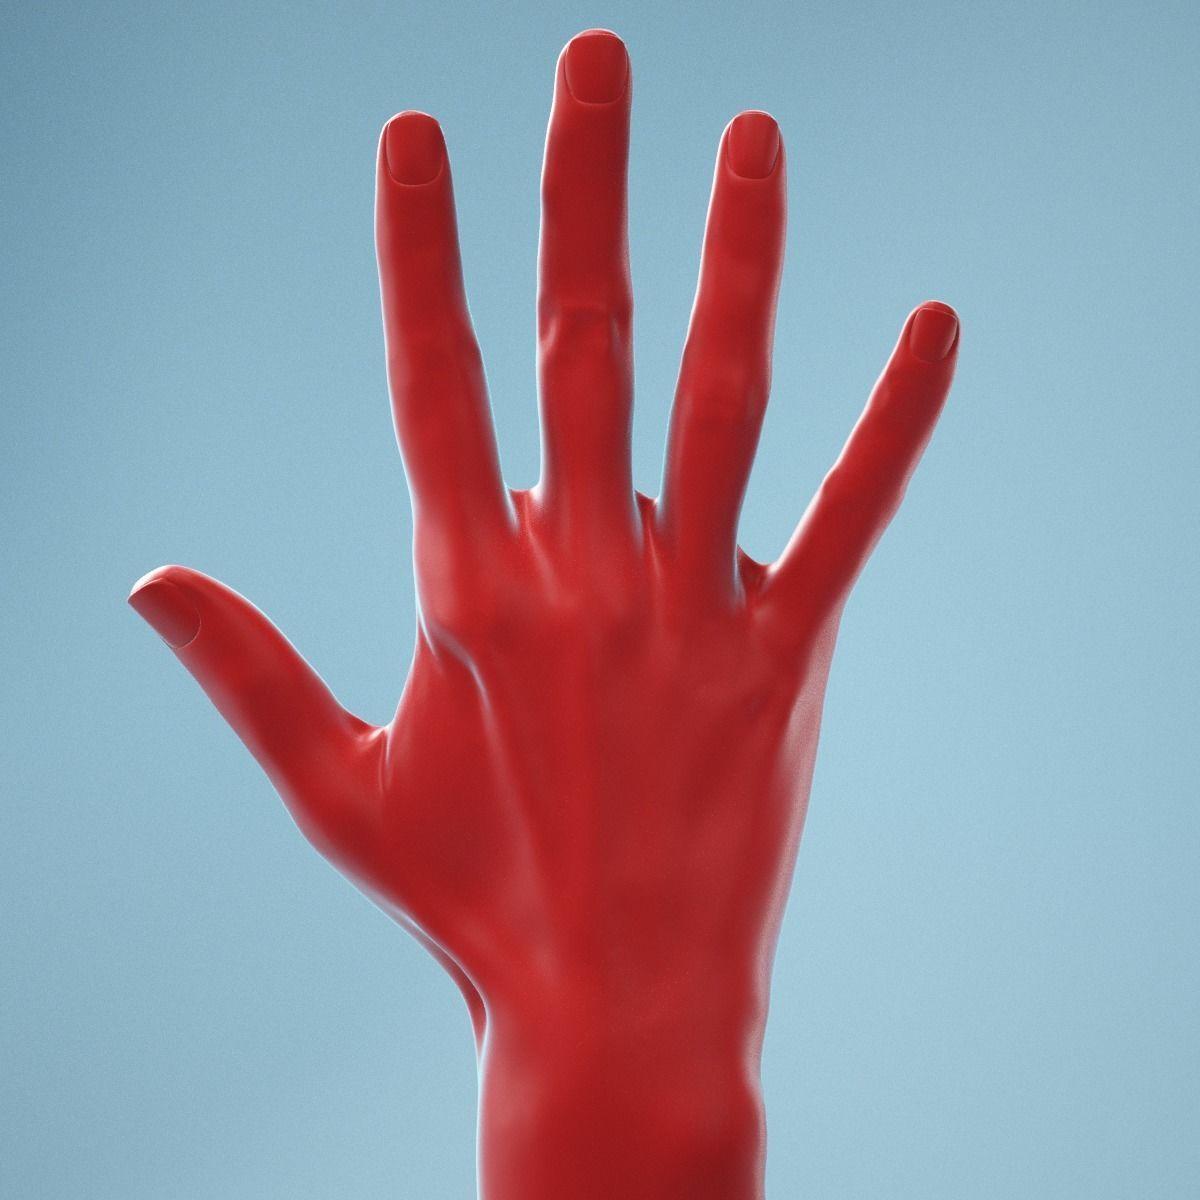 Standard Pose Realistic Hand Model 02